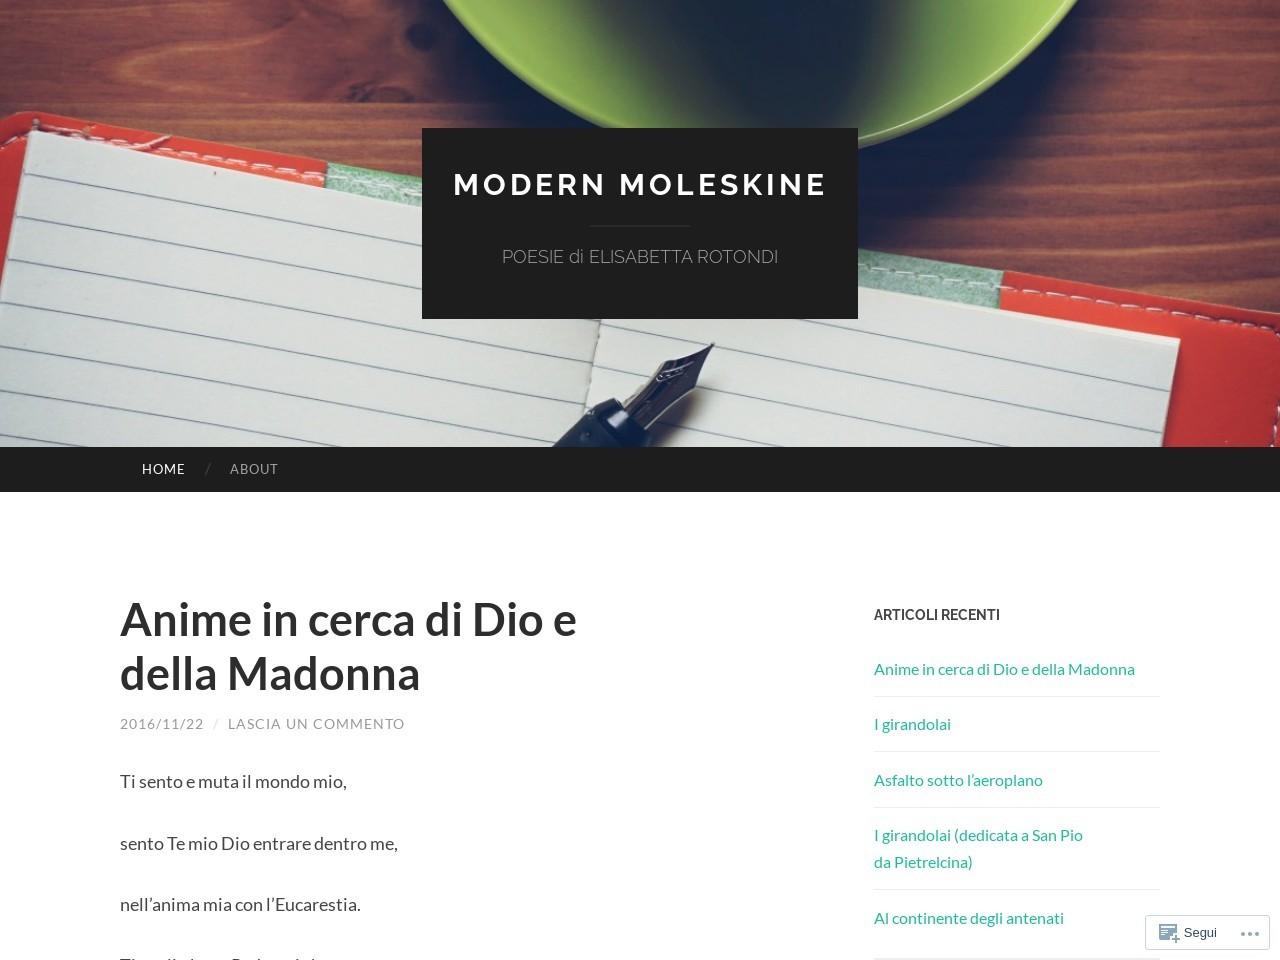 modern-moleskine-by-elisabetta-rotondi